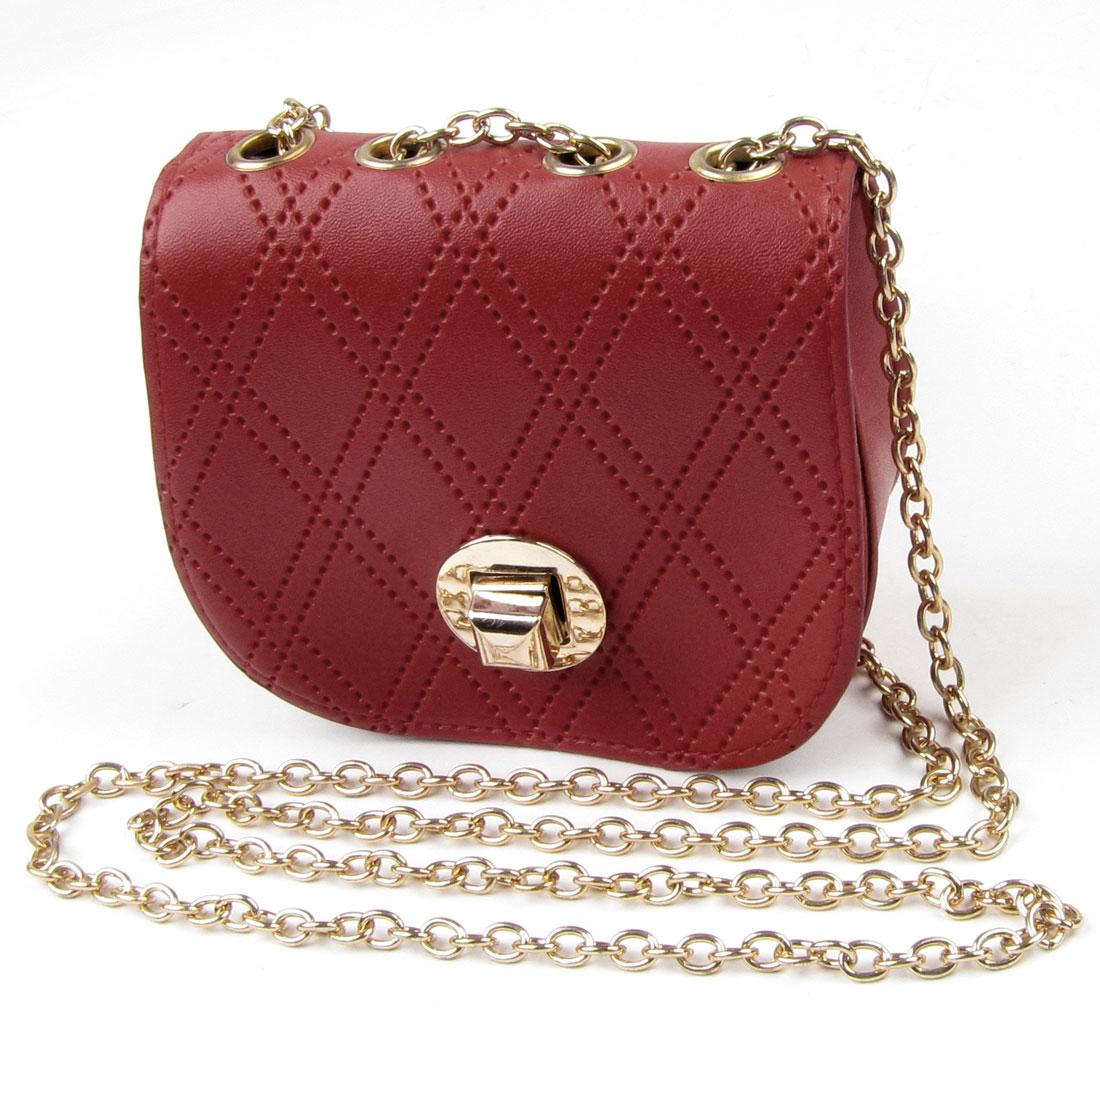 Woman Red Rhombus Print Faux Leather Turn Lock Closure Crossbody Shoulder Bag